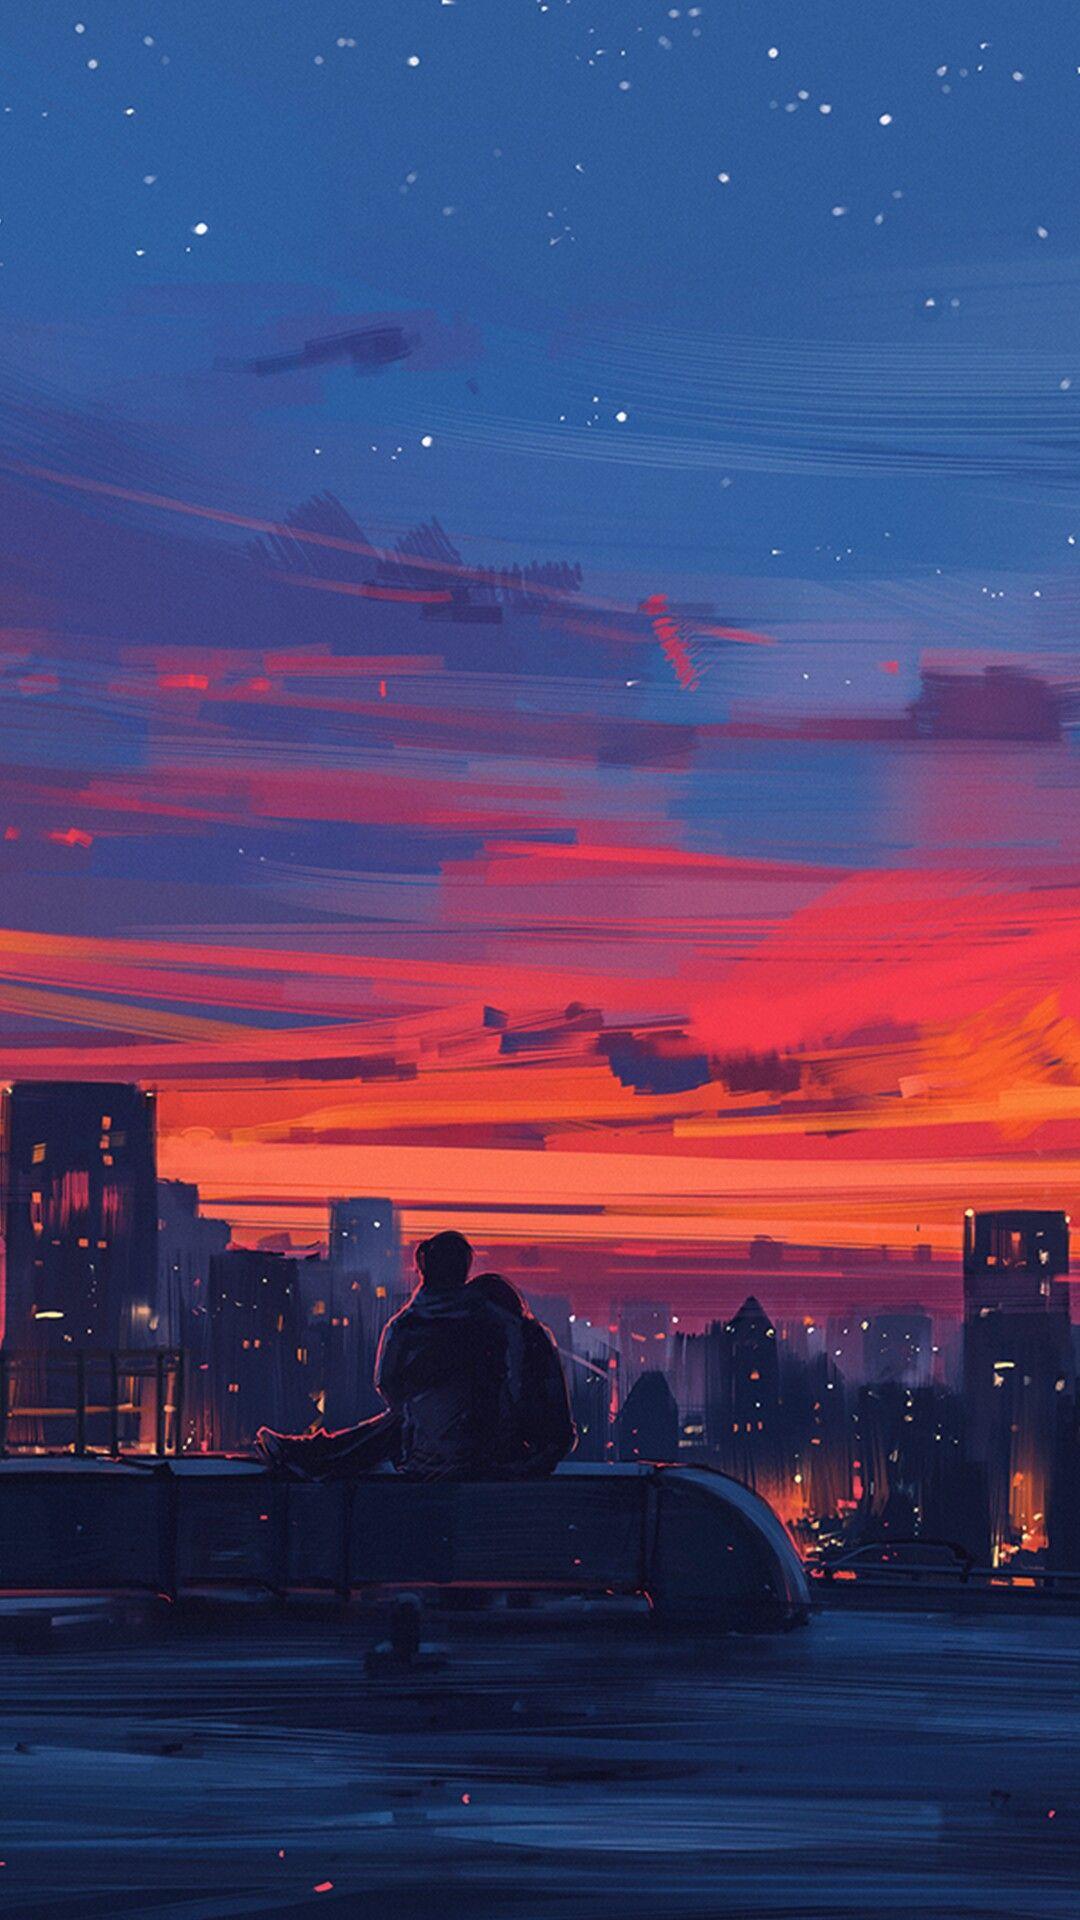 Pin By Cinder On Random Art Scenery Wallpaper Anime Scenery Aesthetic Pastel Wallpaper Hd wallpaper sunset couple street city